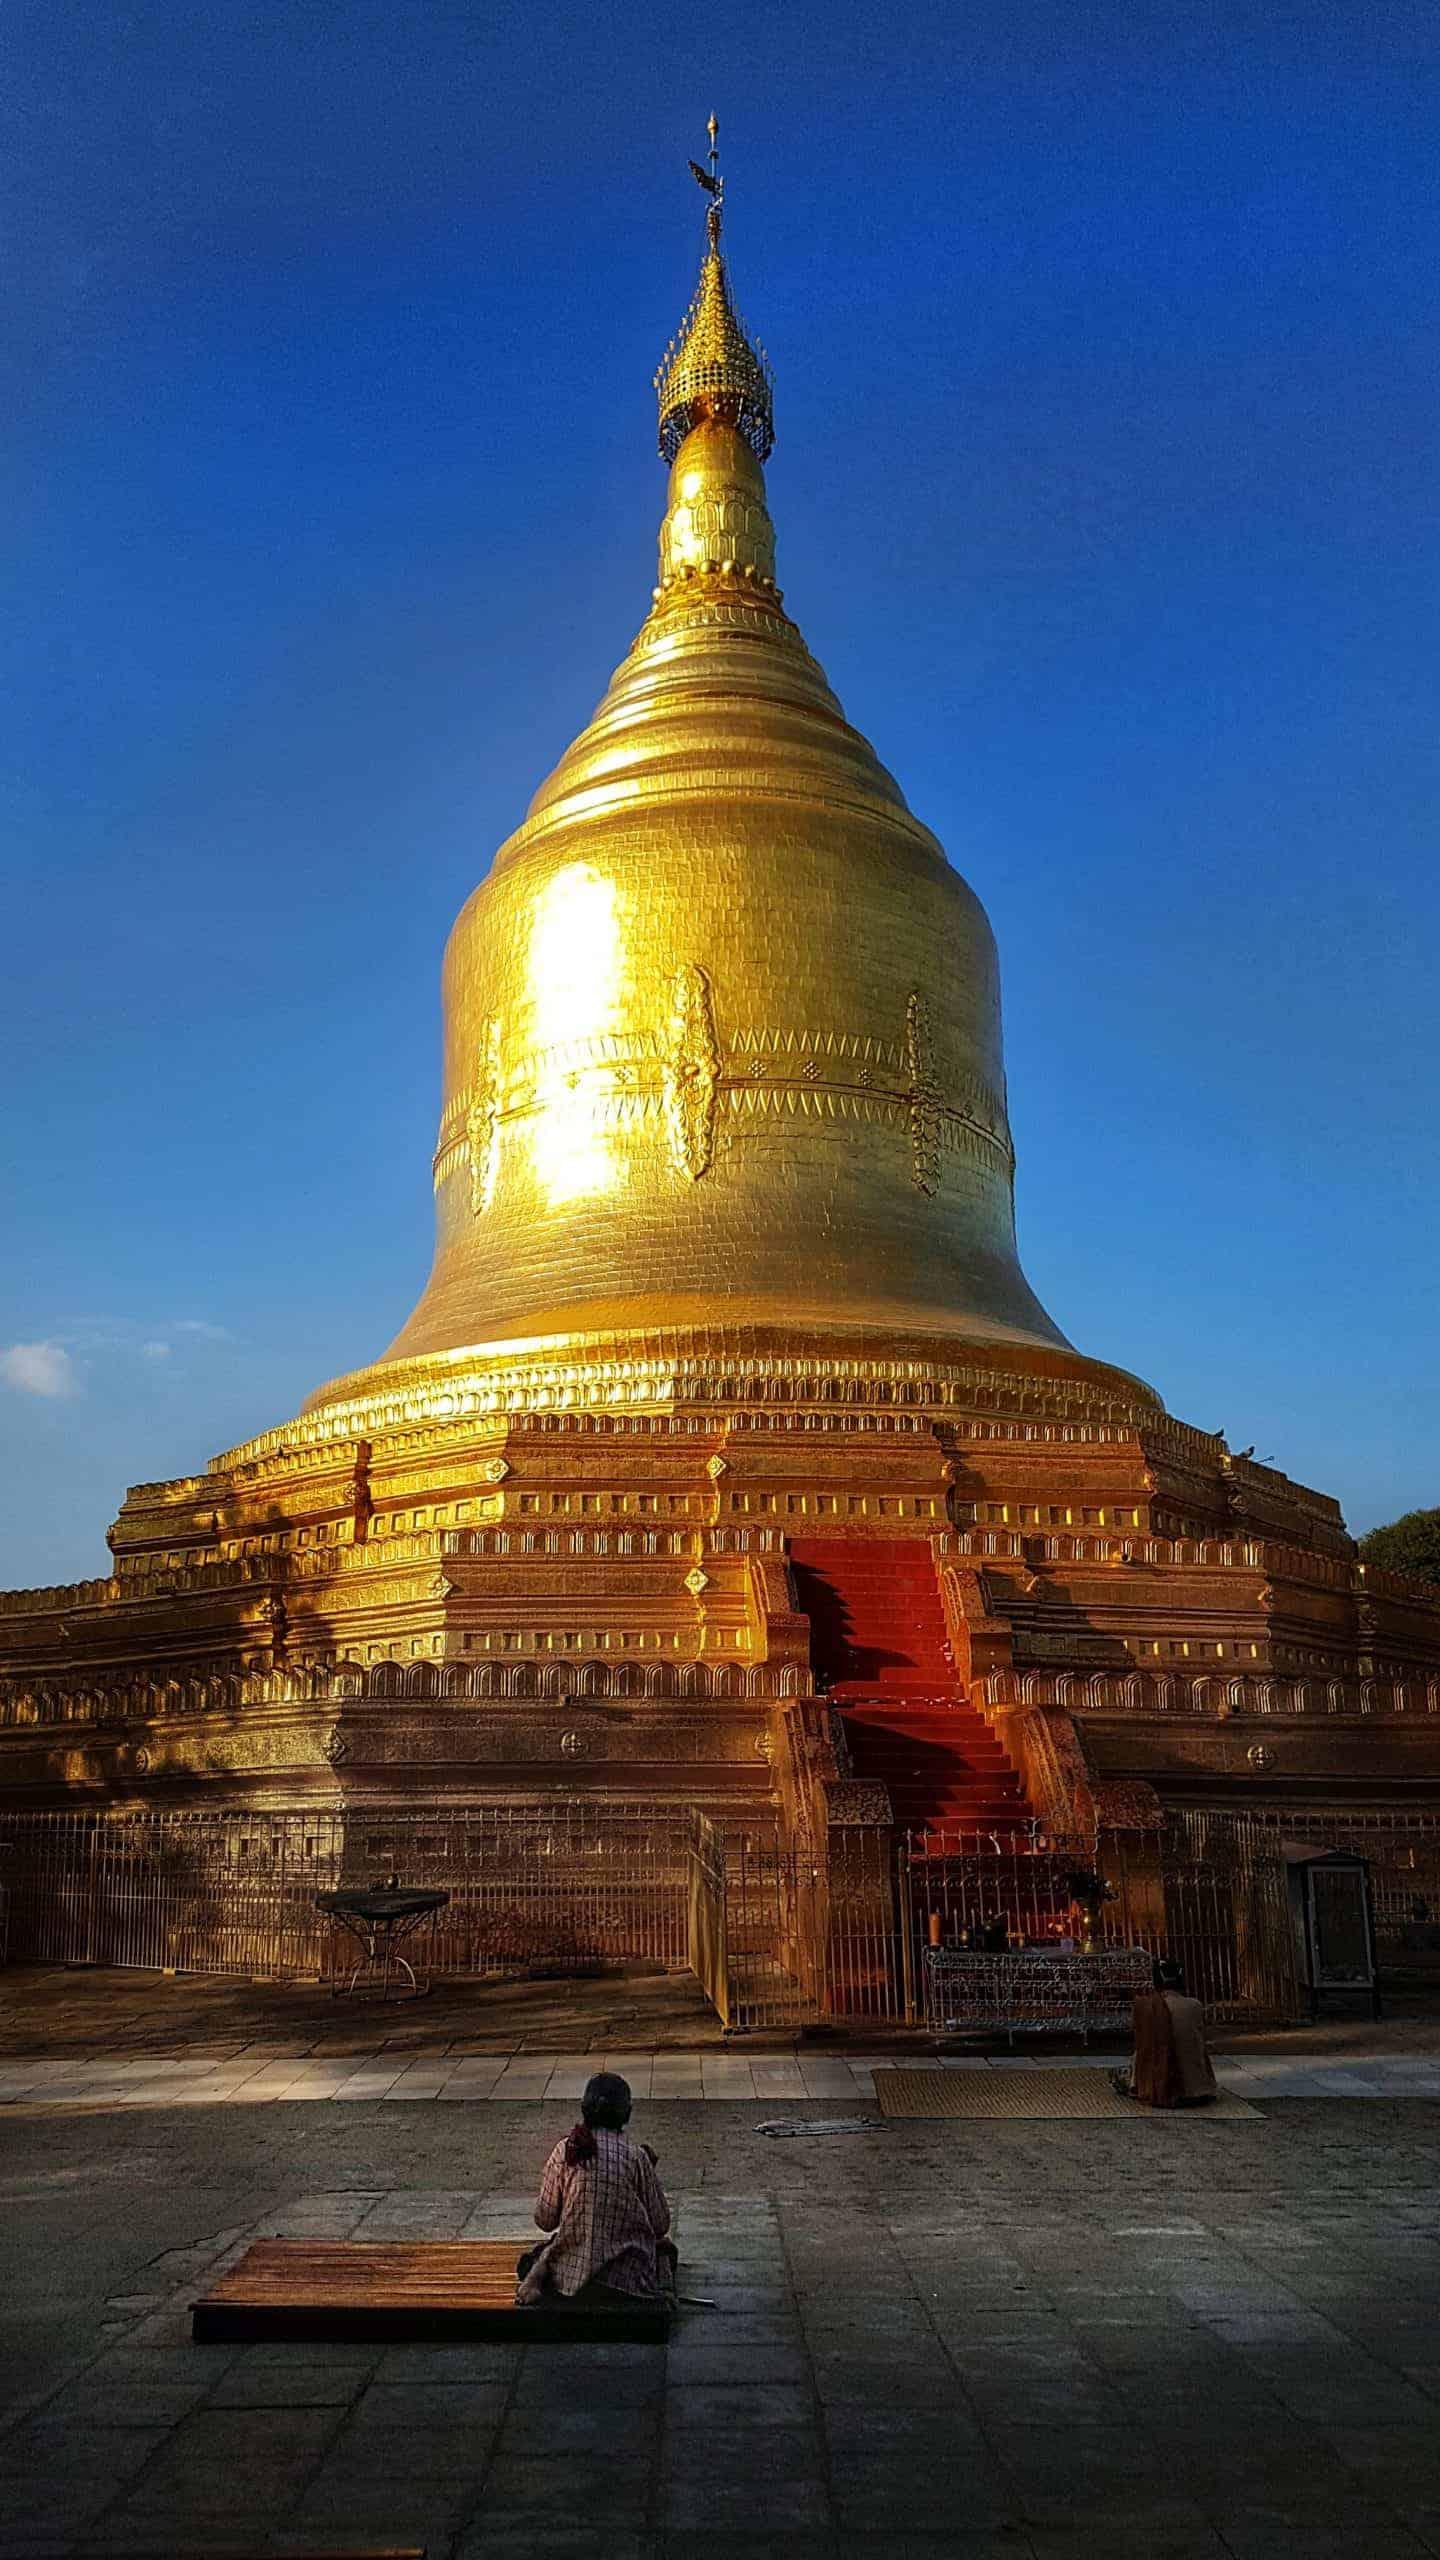 Bagan Stupa